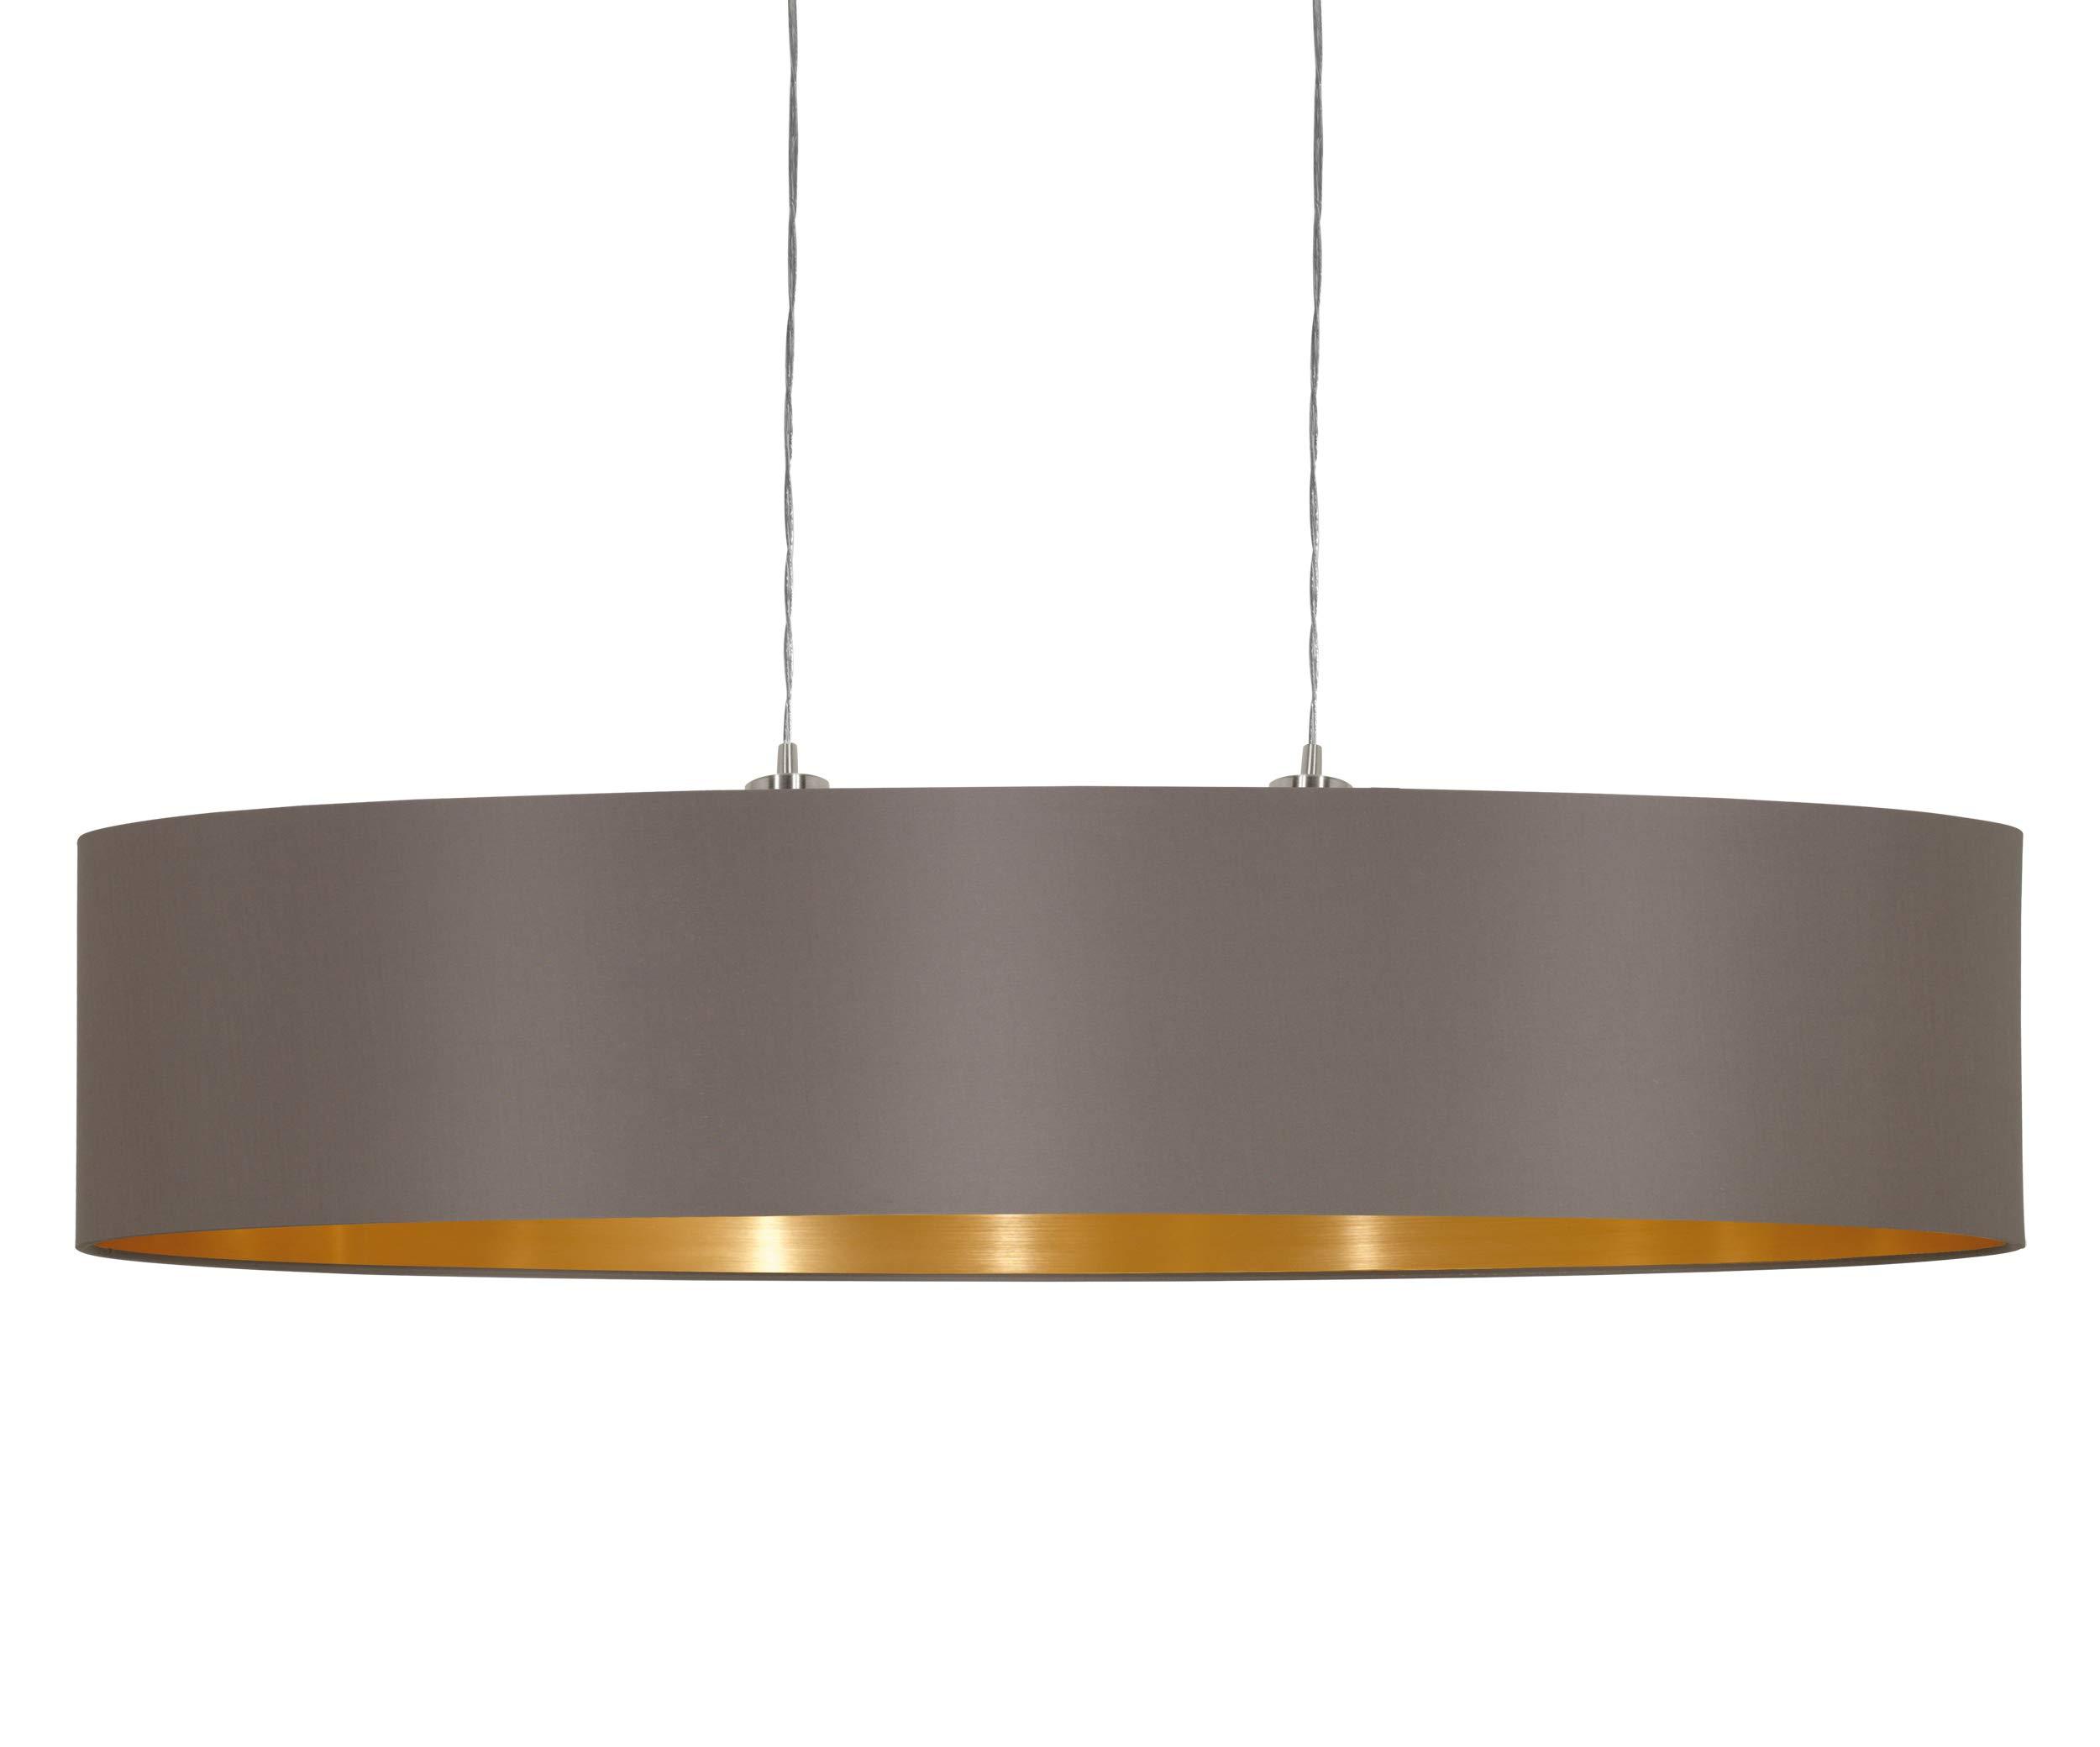 Eglo 31619 Maserlo - Lámpara de techo, con pantalla de níquel mate, Marrón/Acero dorado, 100 cm: Amazon.es: Iluminación